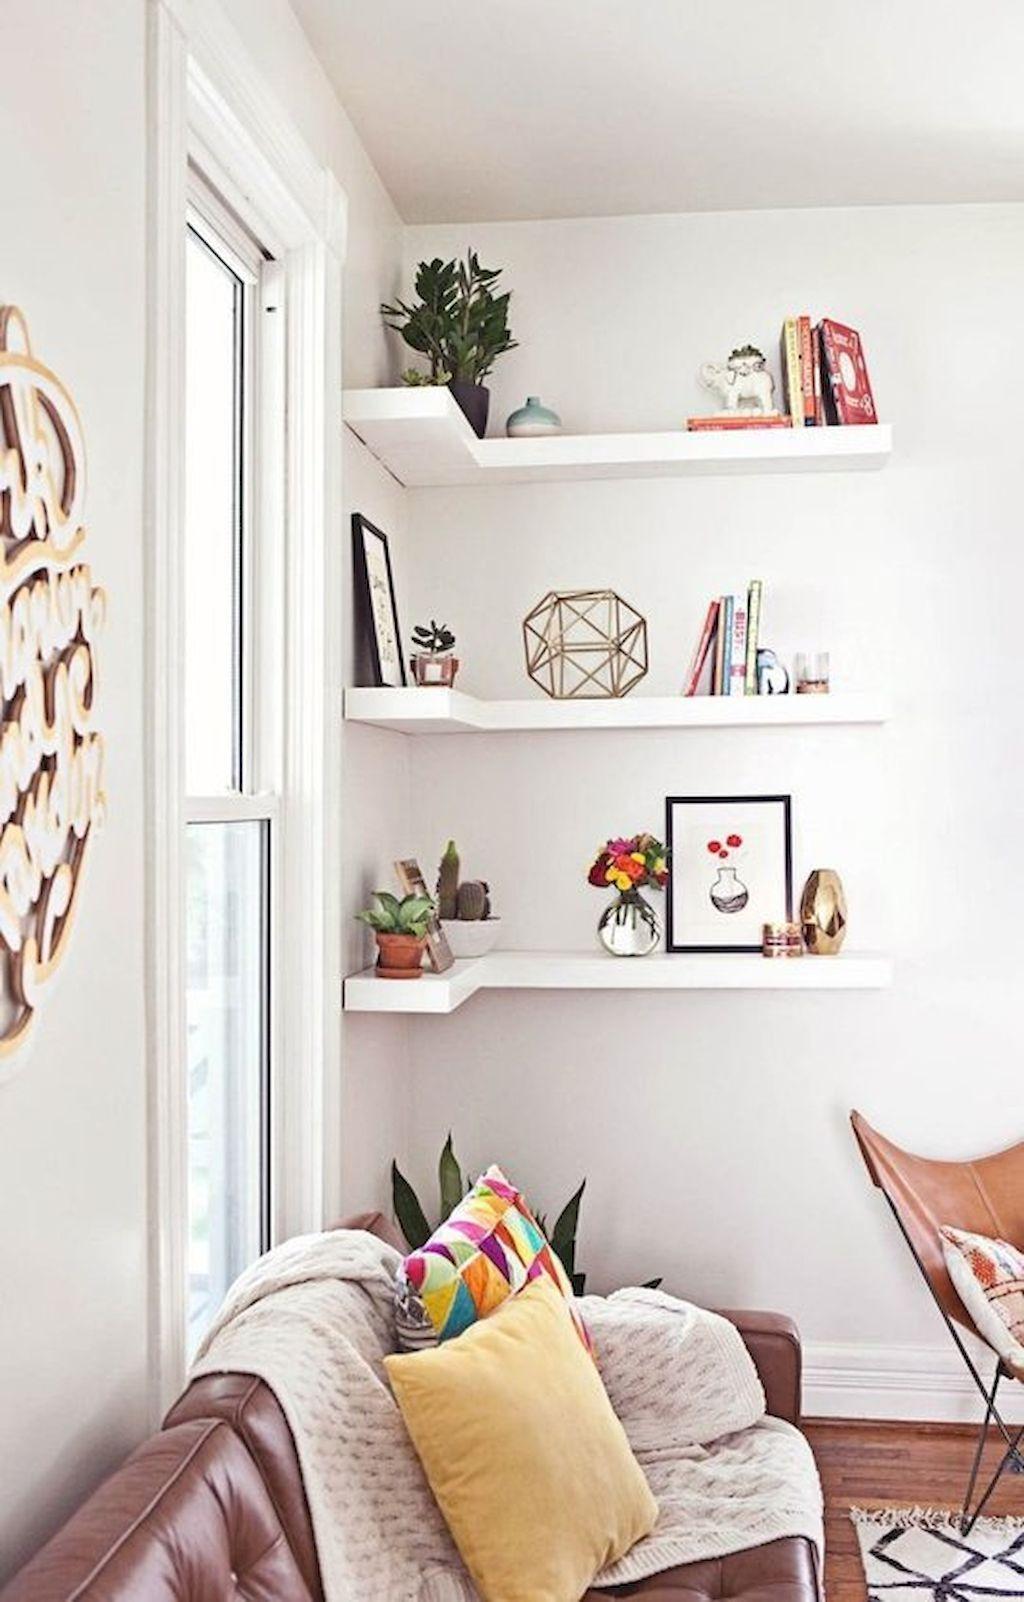 Stunning small living room decor ideas on